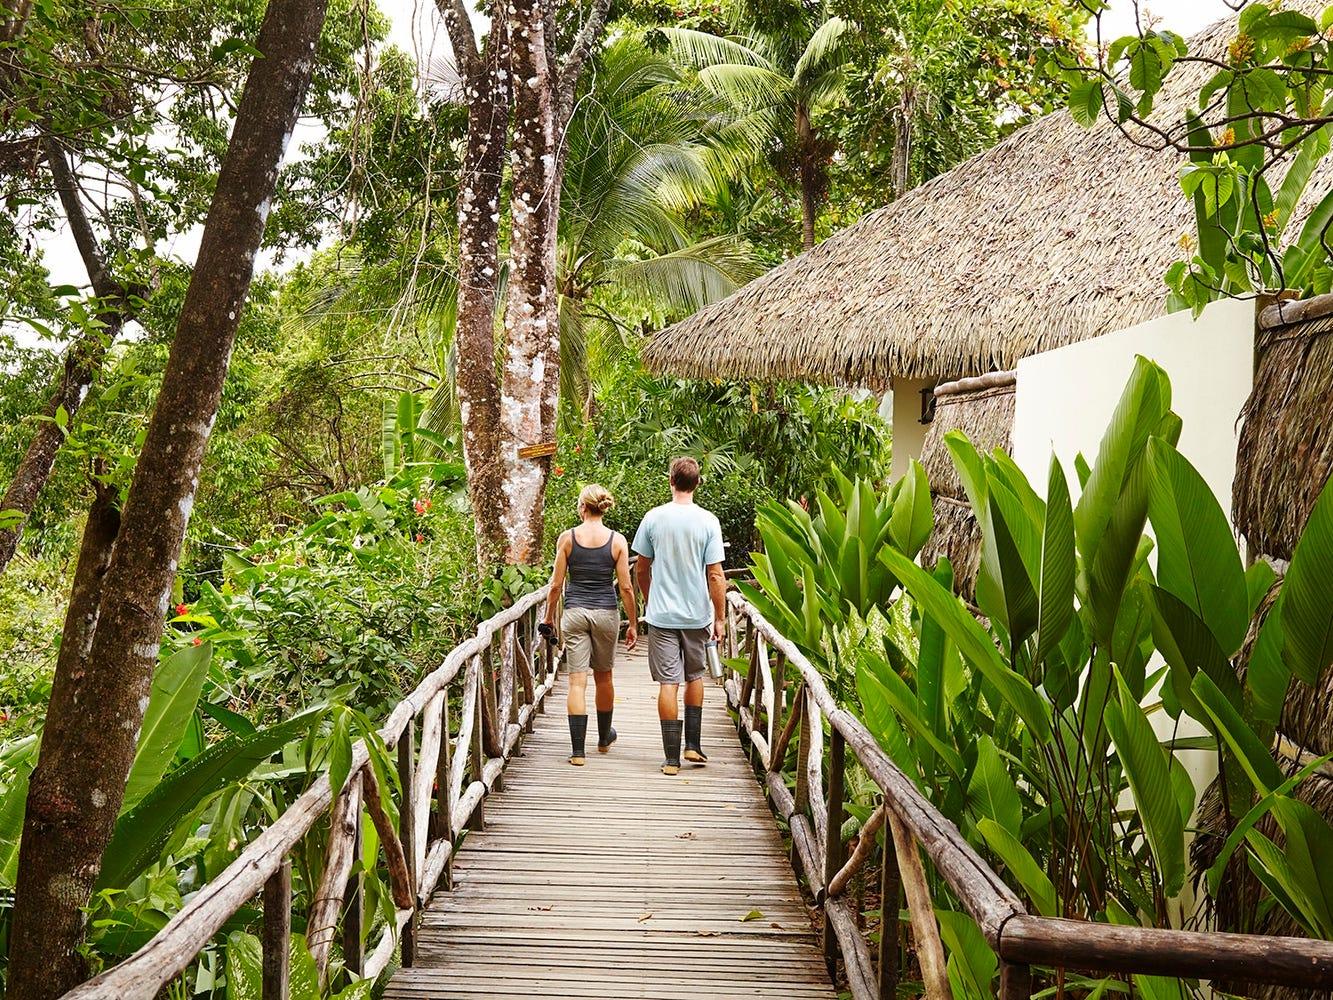 Rates at Lapa Rios Lodge vary depending on the season and begin at $280 per adult.